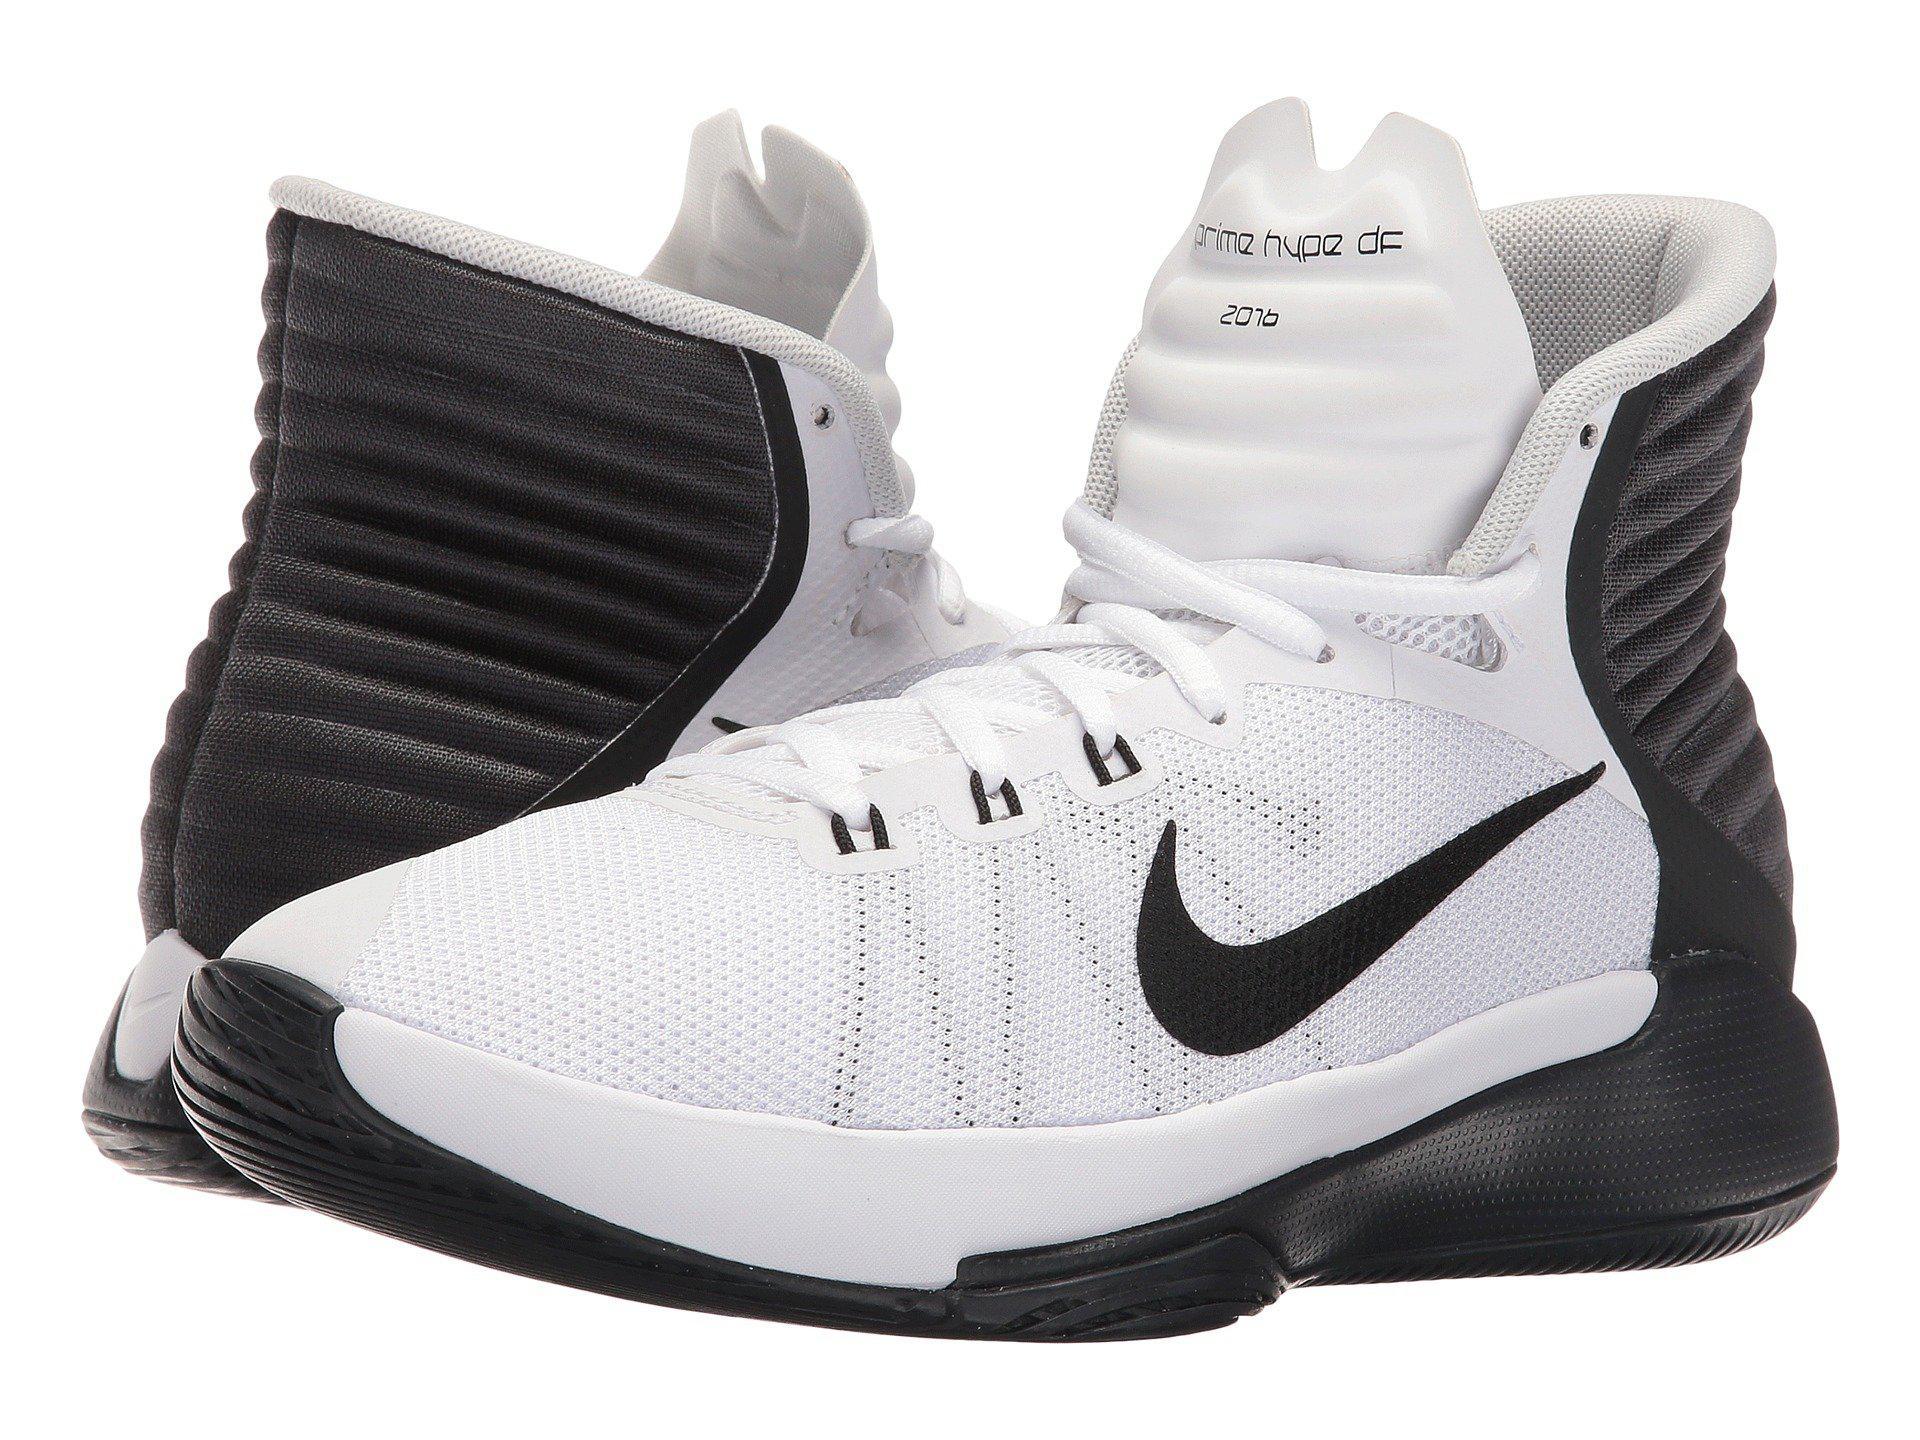 pretty nice 3ccd5 3b217 Nike - Multicolor Prime Hype Df 2016 - Lyst